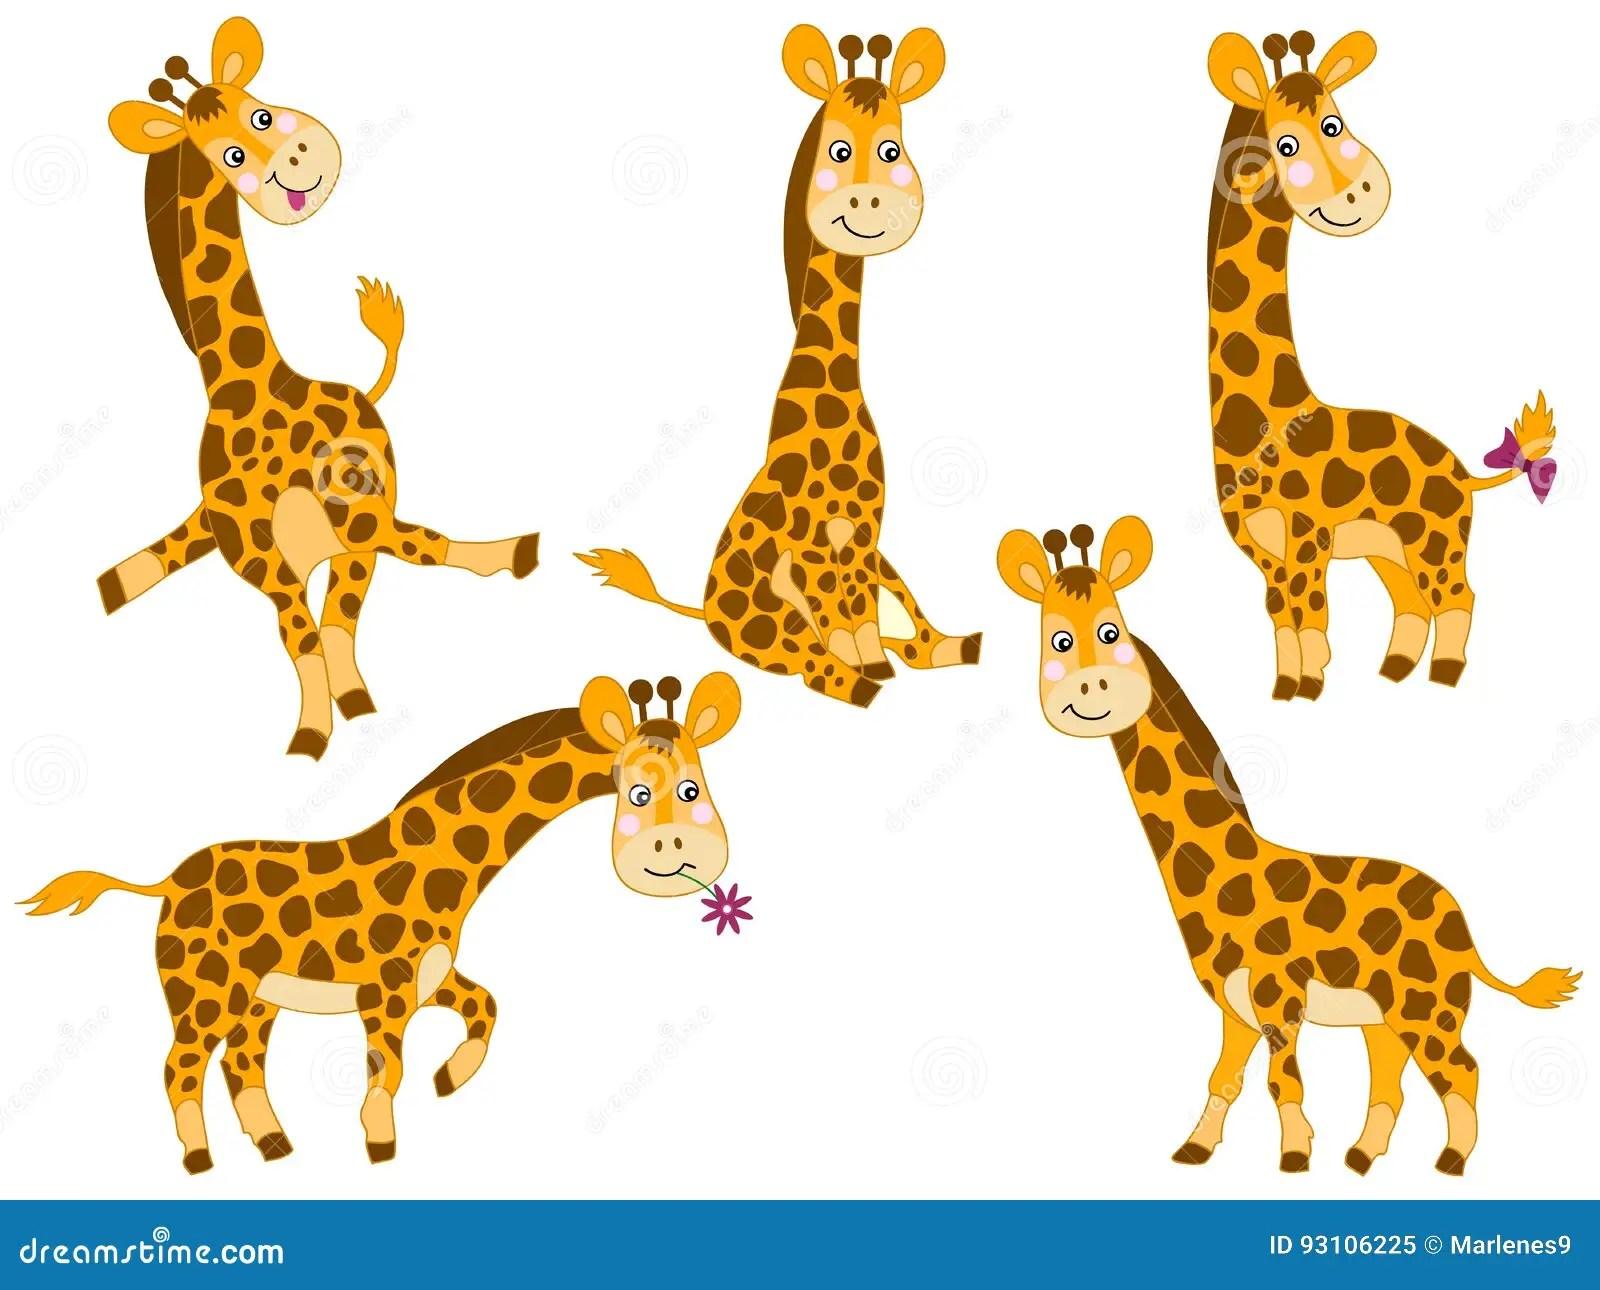 hight resolution of vector giraffes set